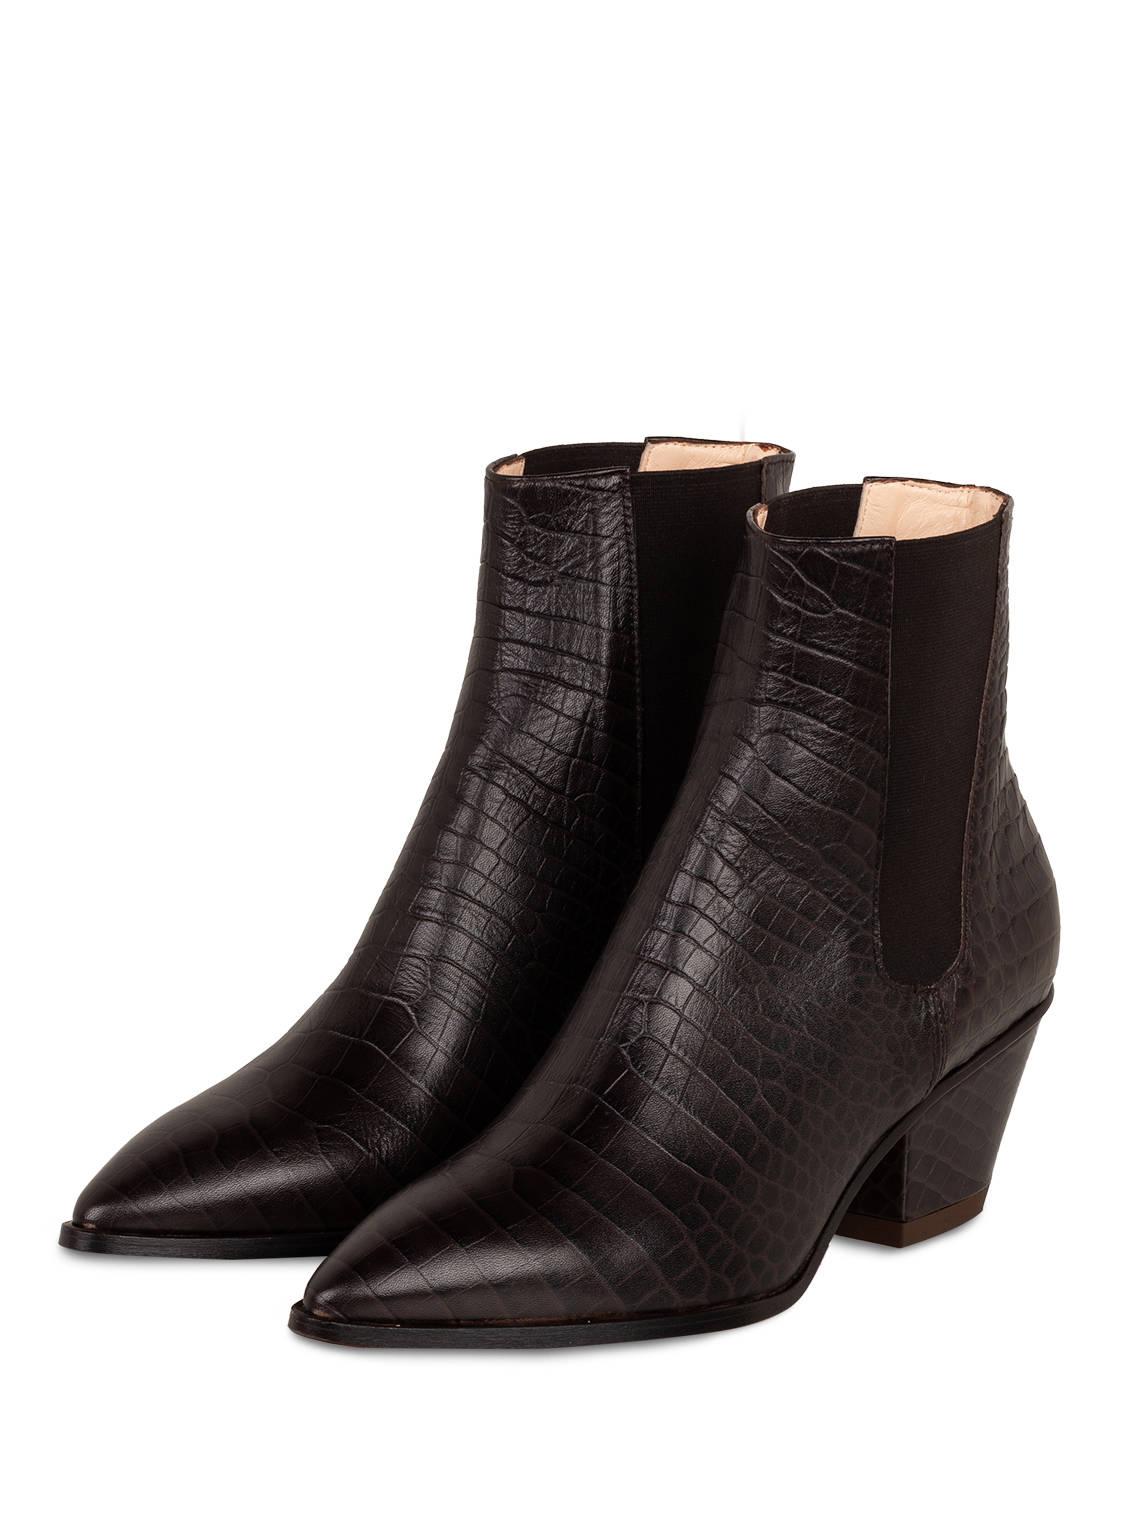 Image of Agl Attilio Giusti Leombruni Cowboy Boots braun